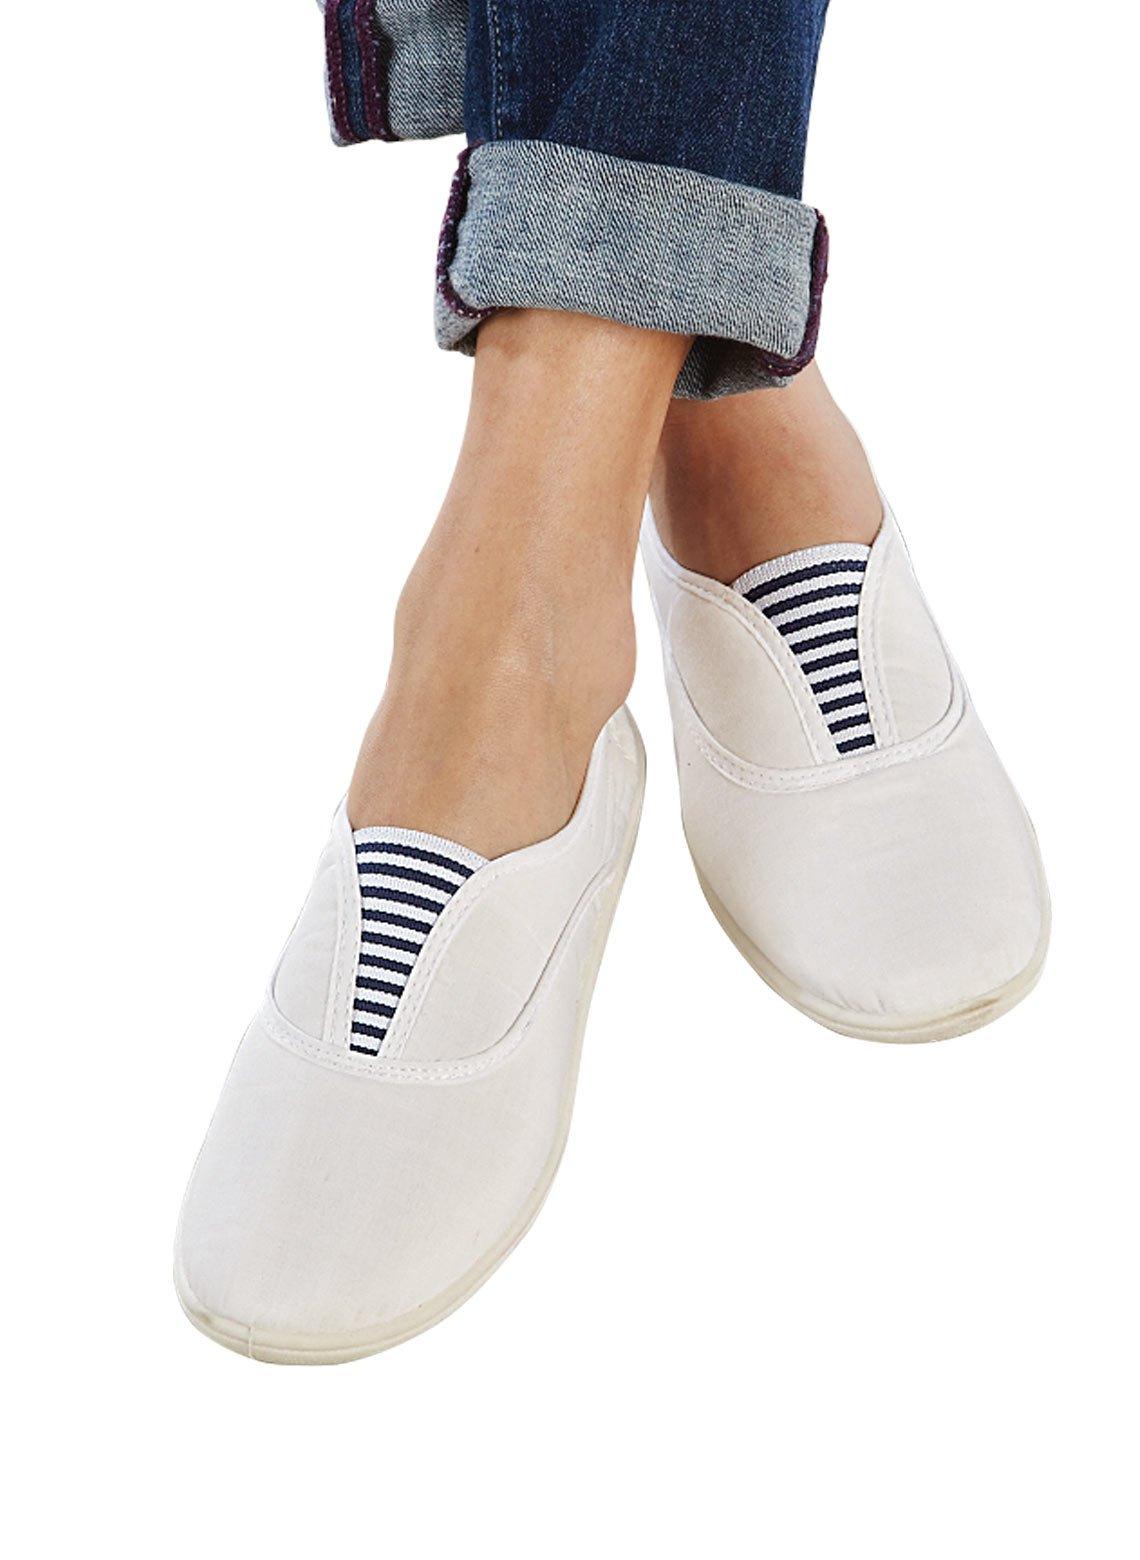 Carefree Canvas Slip-Ons, White, Size 6-1/2 (Medium)